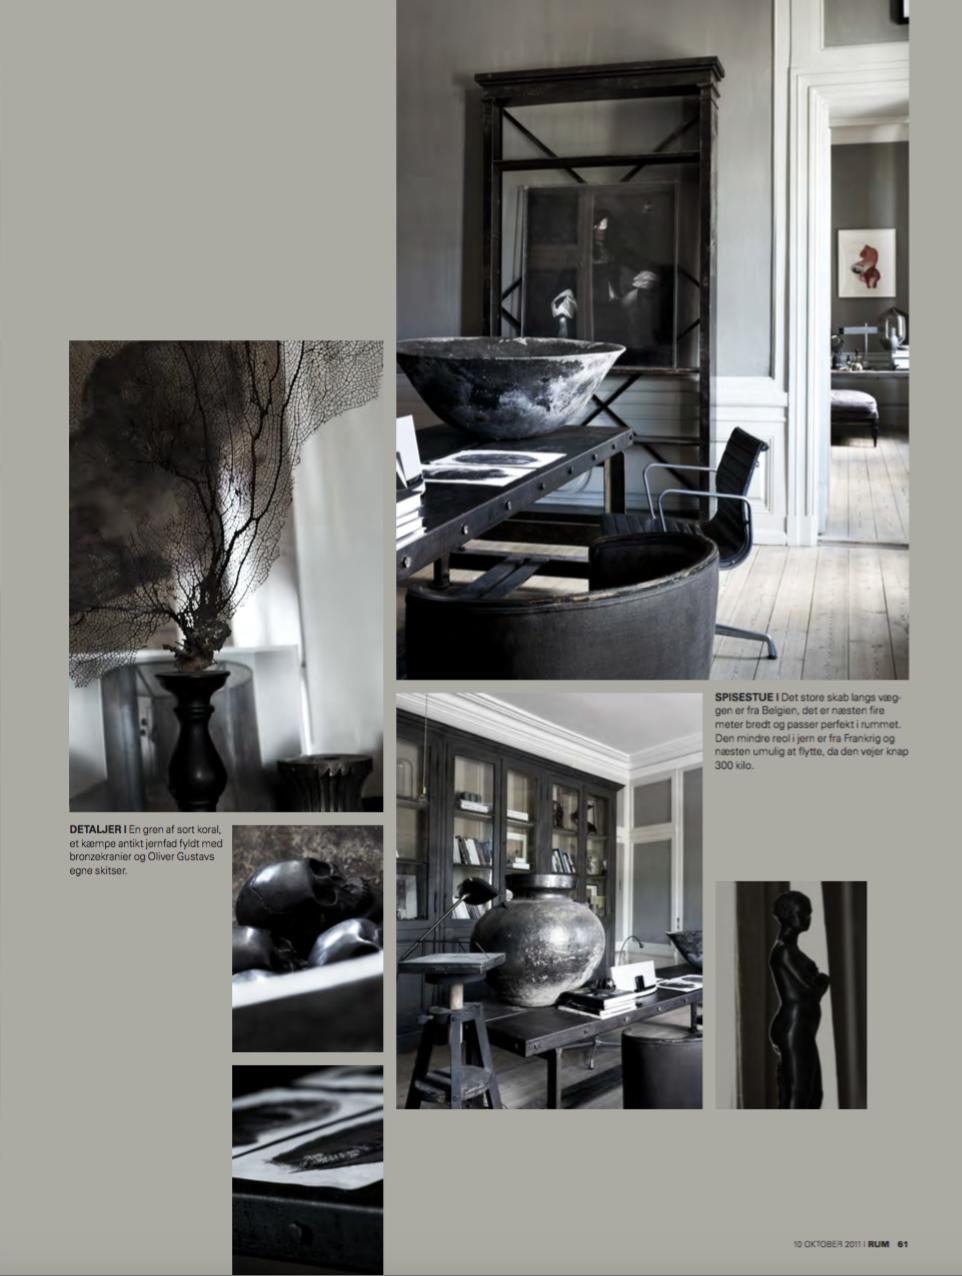 Interview in RUM magazine with studio Oliver Gustav